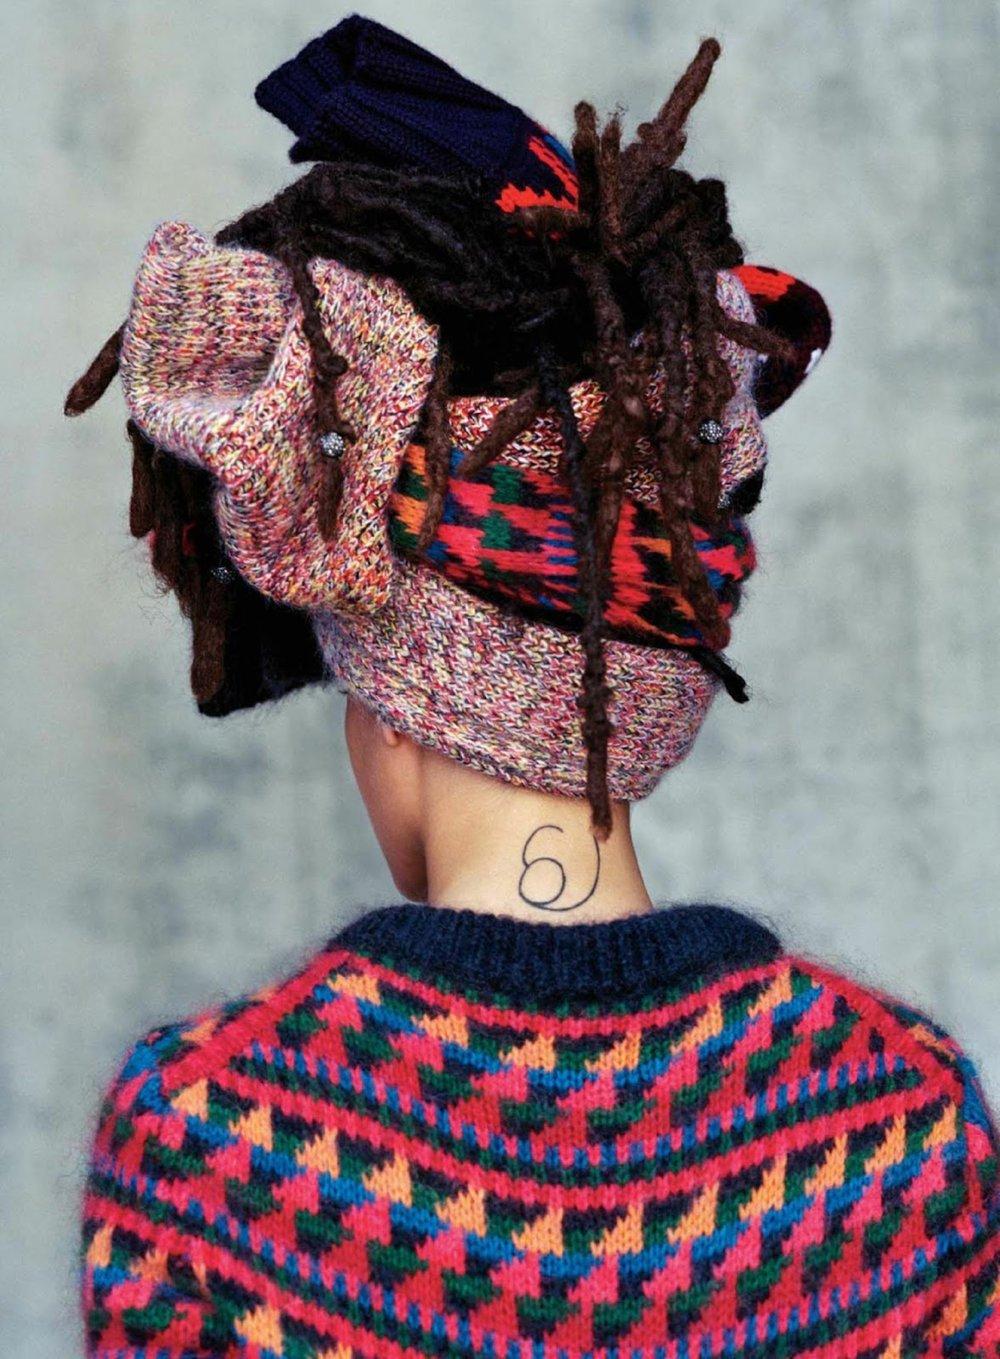 Vogue USA October 2017-Bruce-Weber- (7).jpg